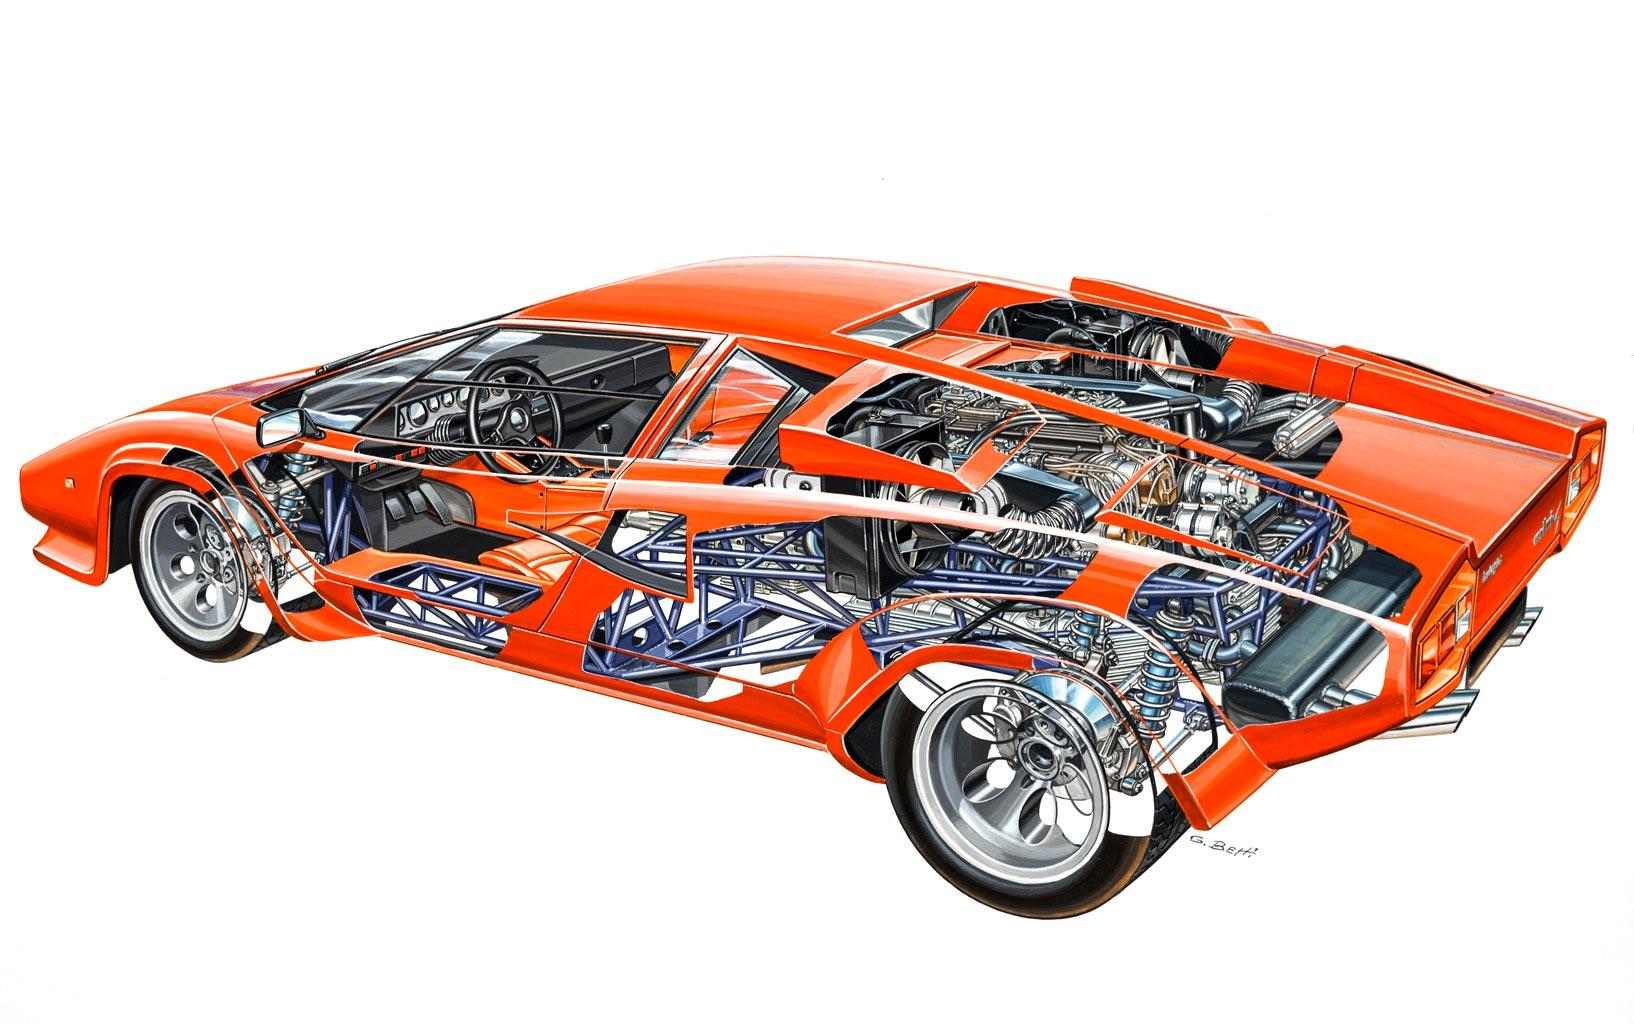 Lamborghini Countach LP400 S cutaway drawing